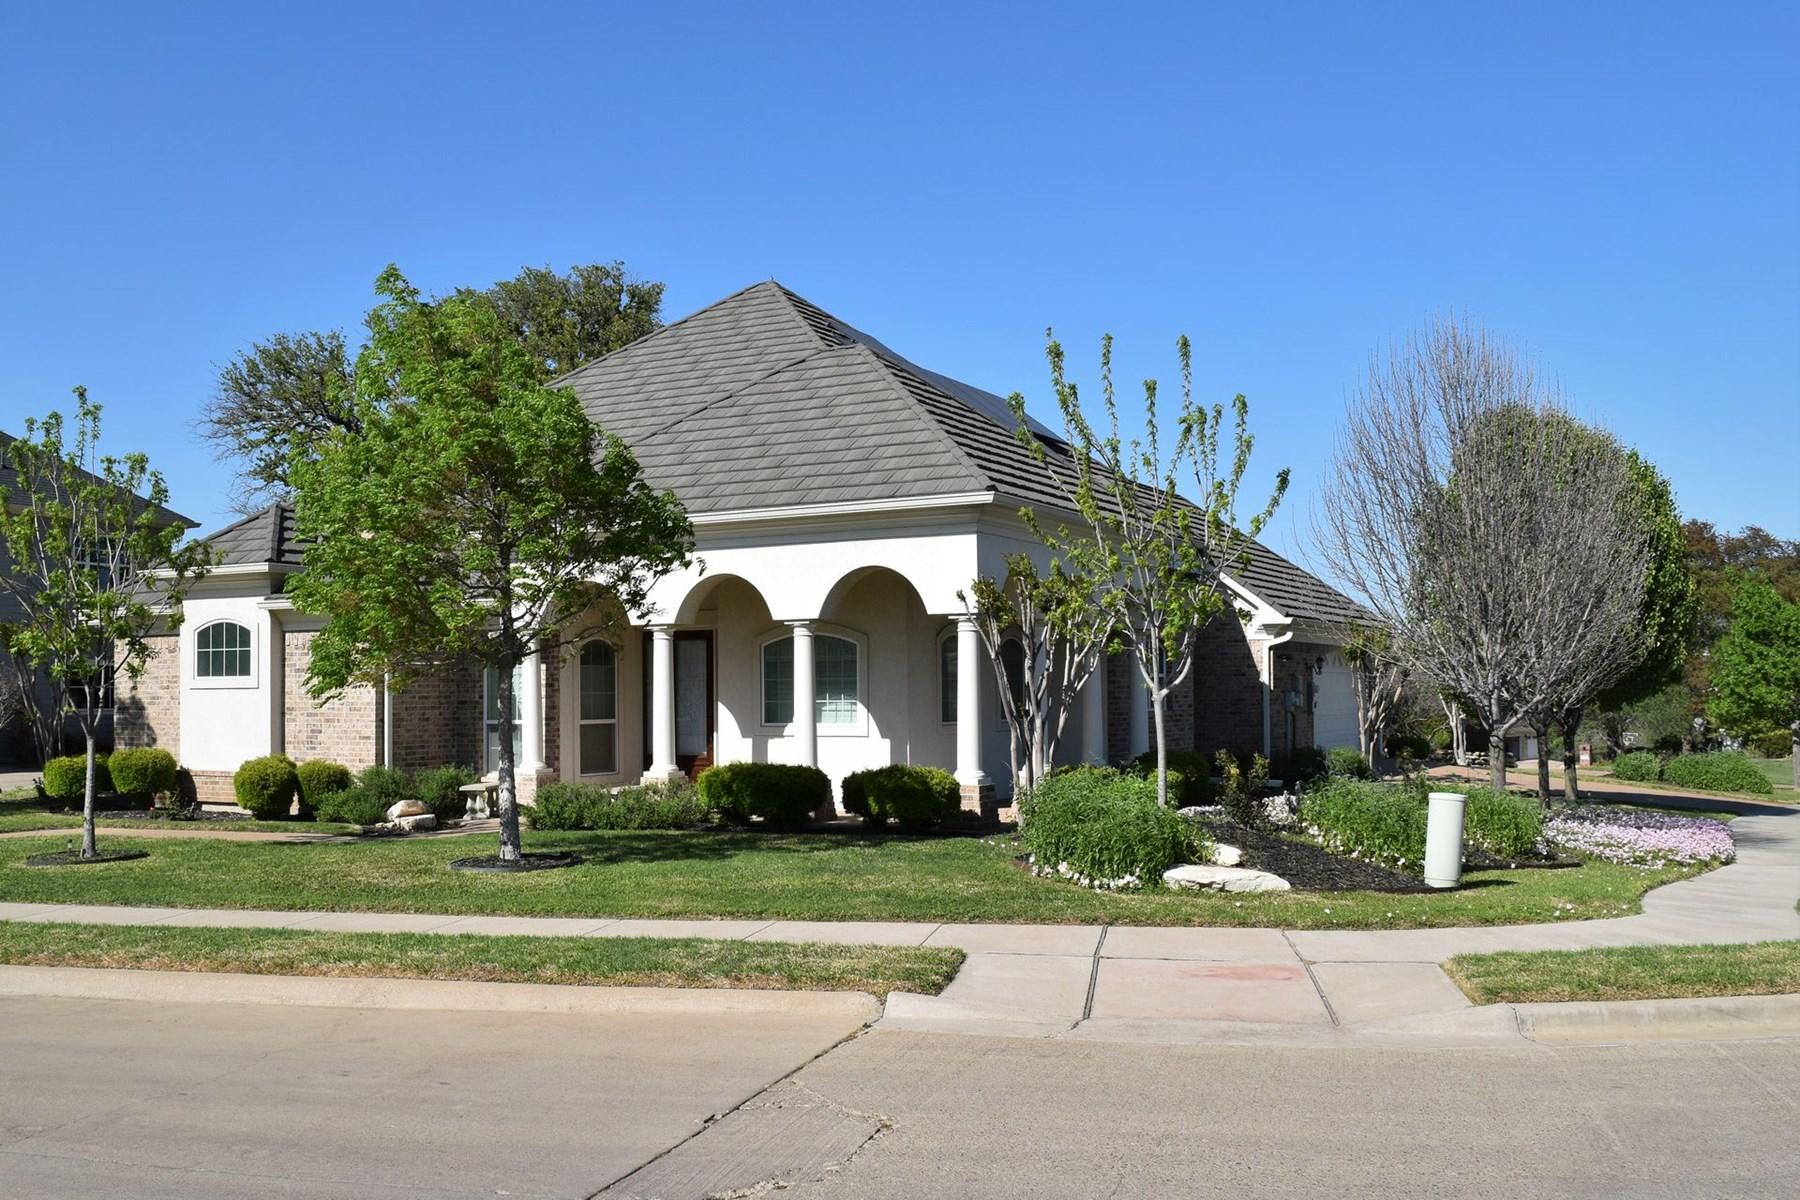 Home for sale waco, Texas. Mclennan County